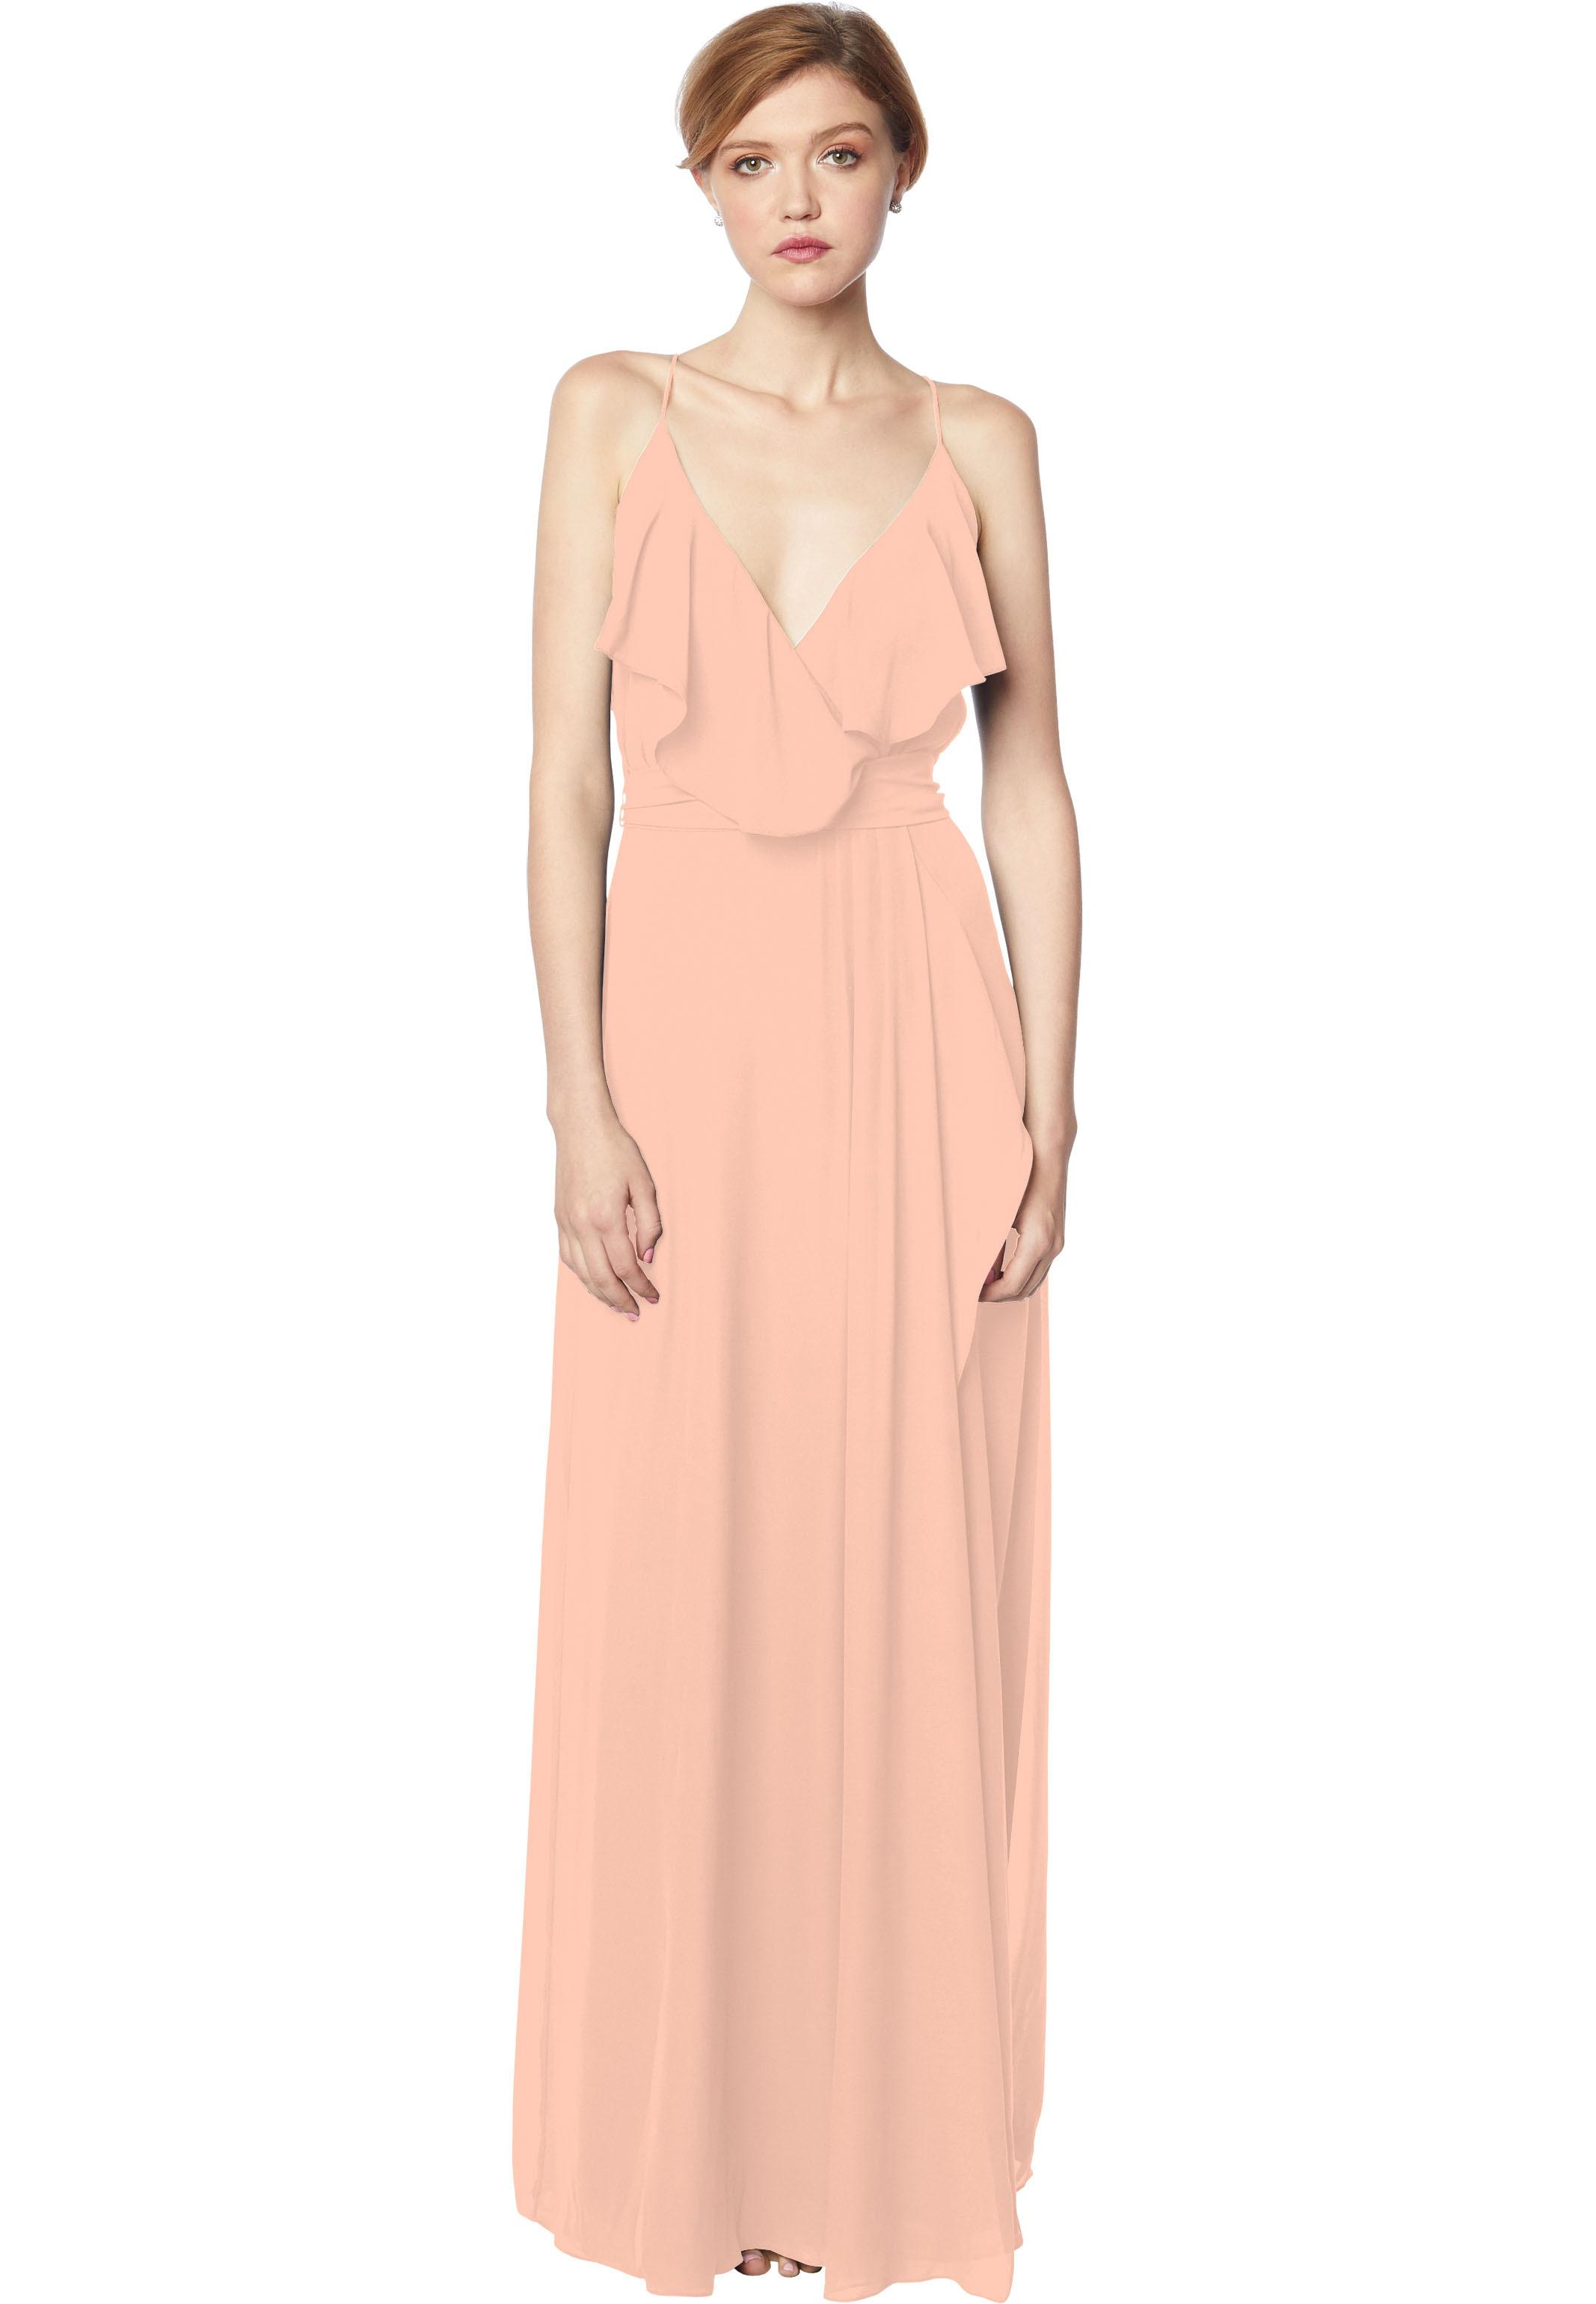 Bill Levkoff PEACH Chiffon V-neck A-line gown, $176.00 Front